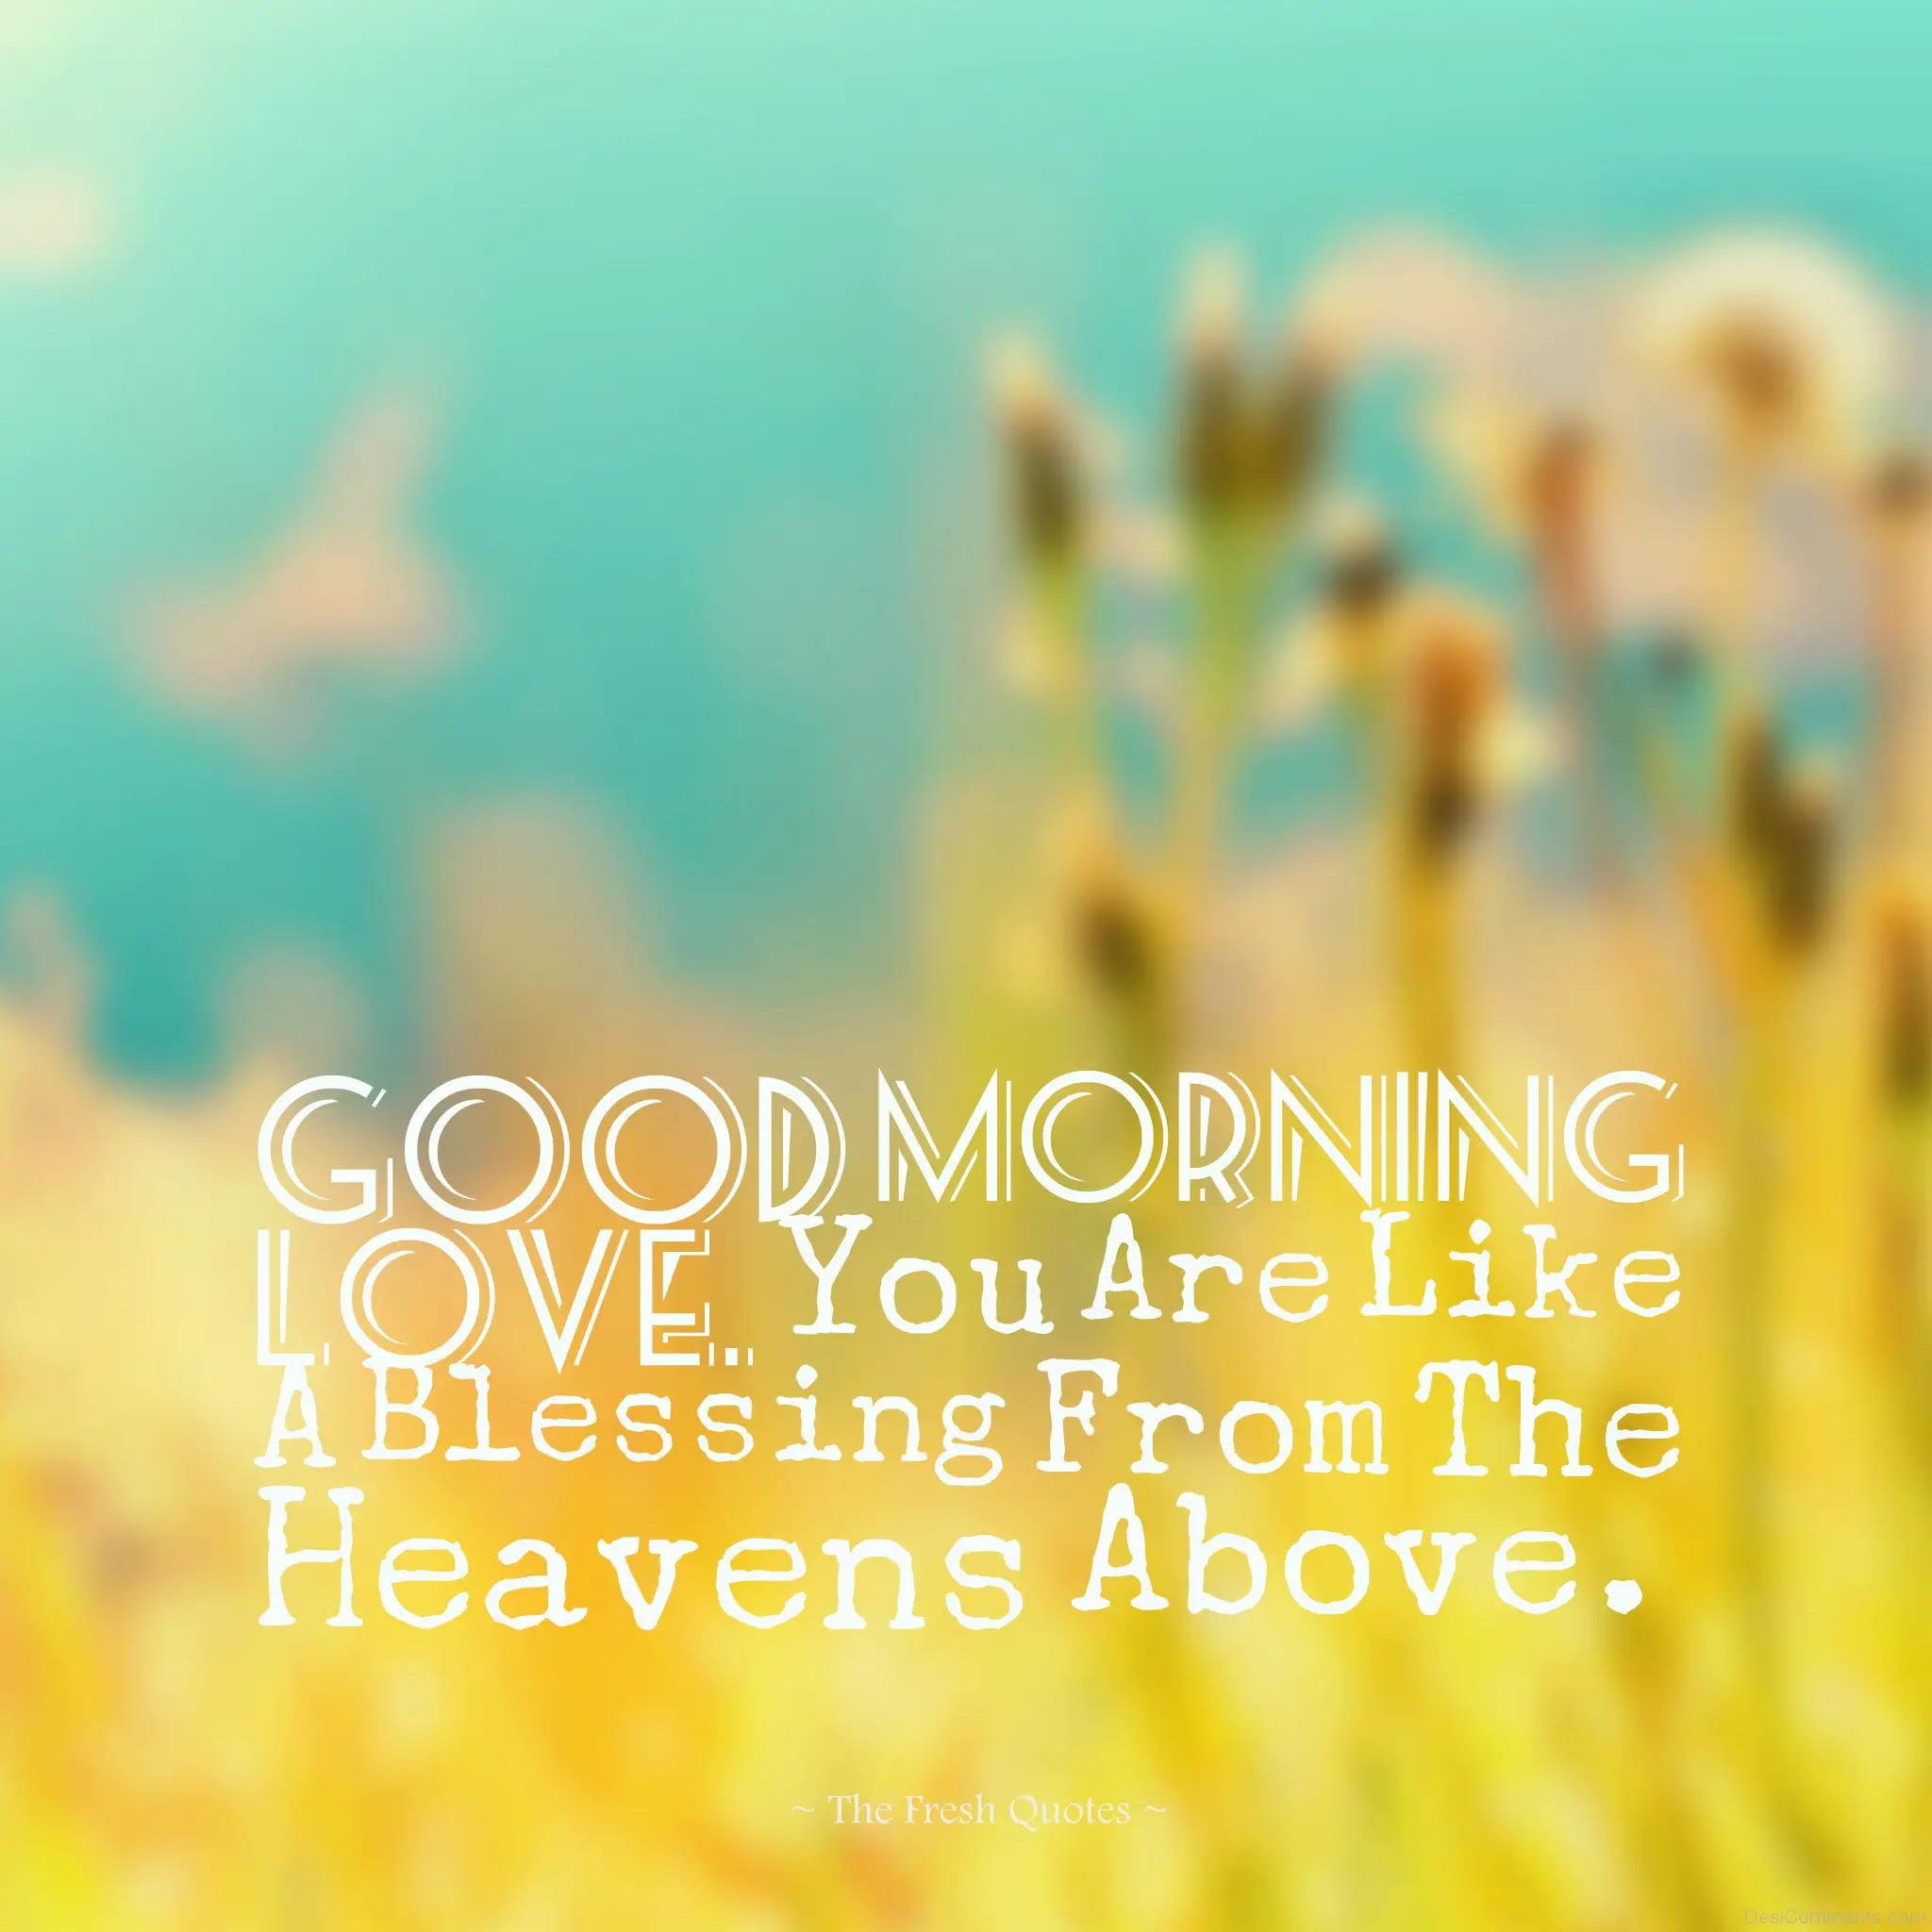 Good Morning Love - DesiComments.com